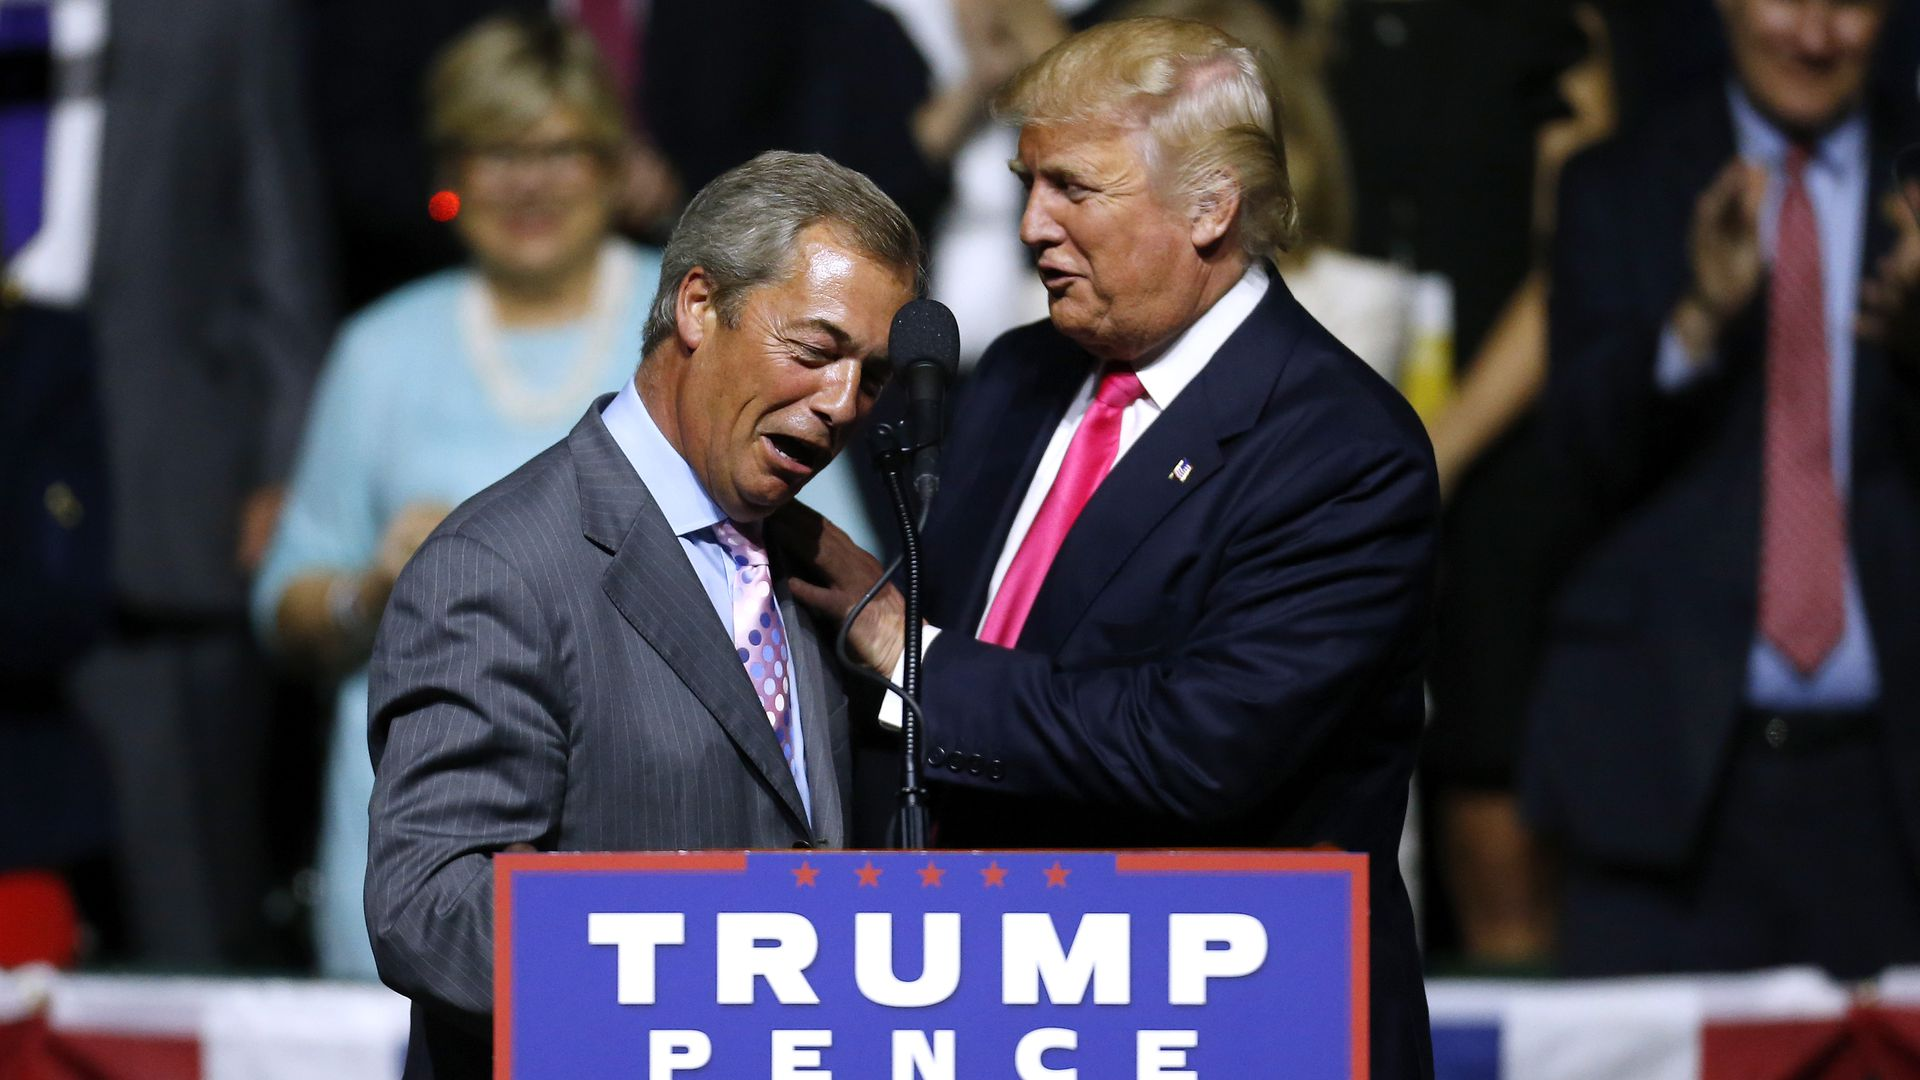 Brexit Trumped